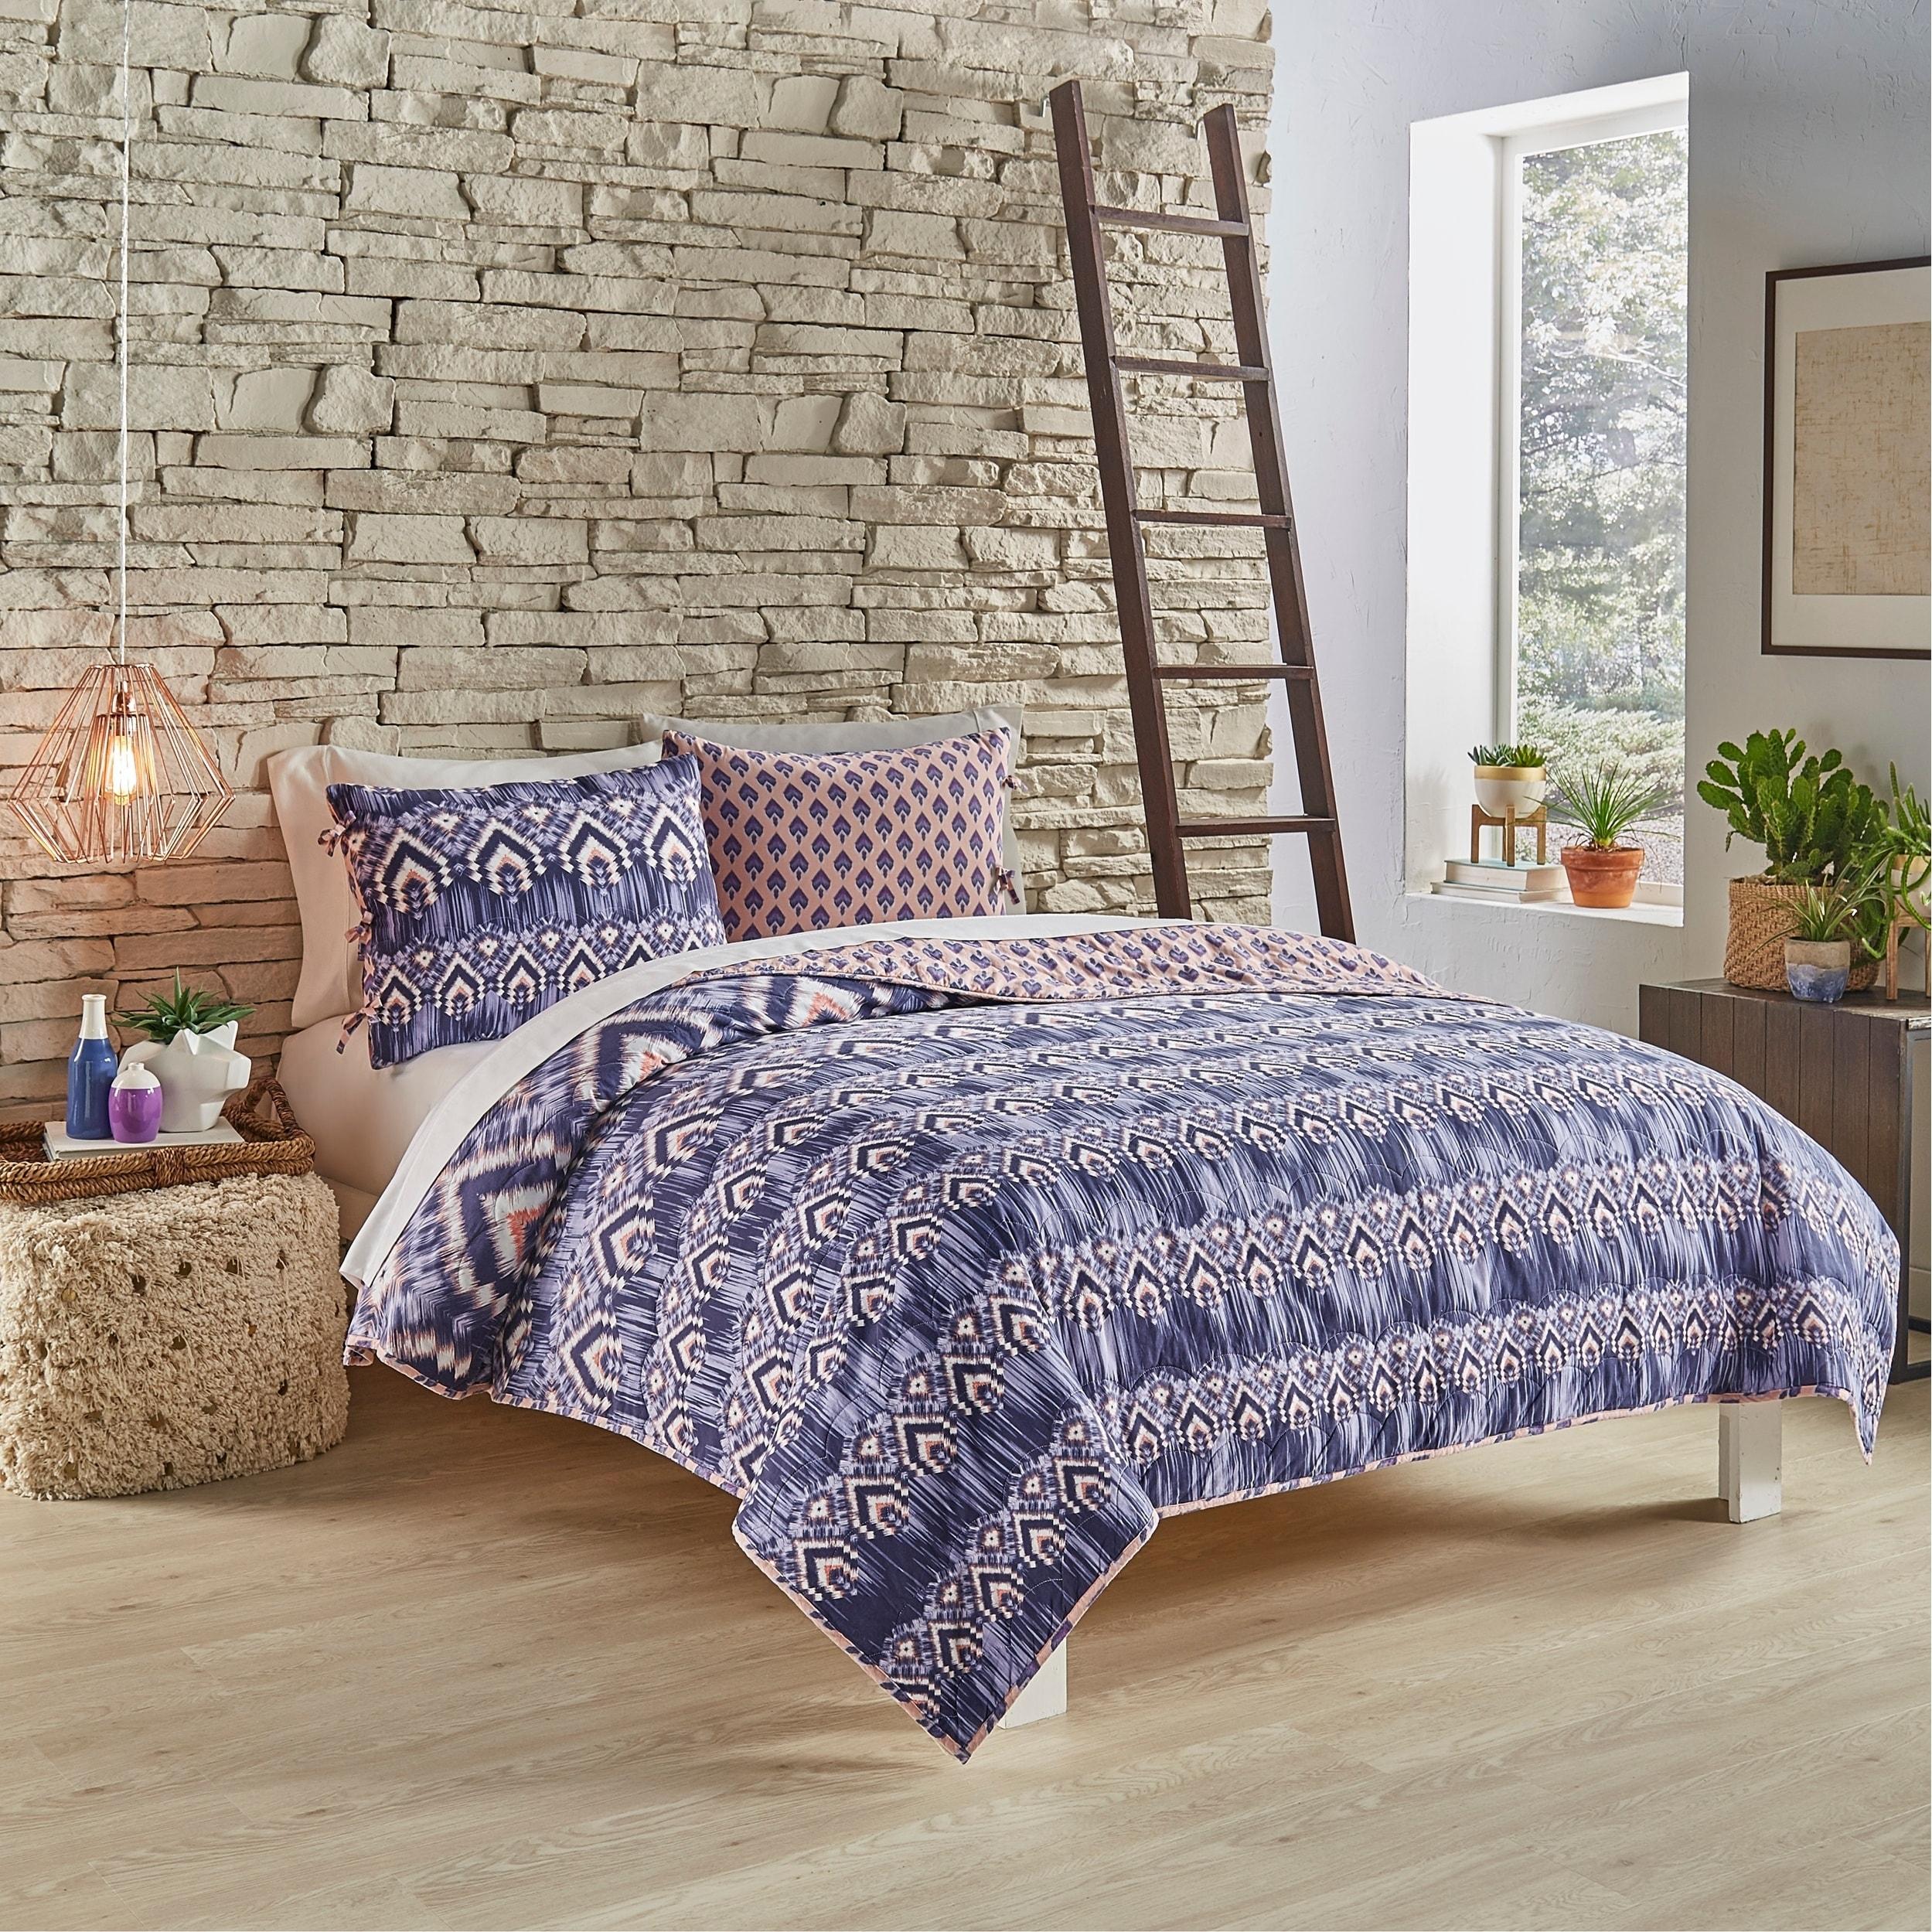 boho indian hp decor bedding cotton doona quilt set mandala king comforter duvet quilts size cover bohemian